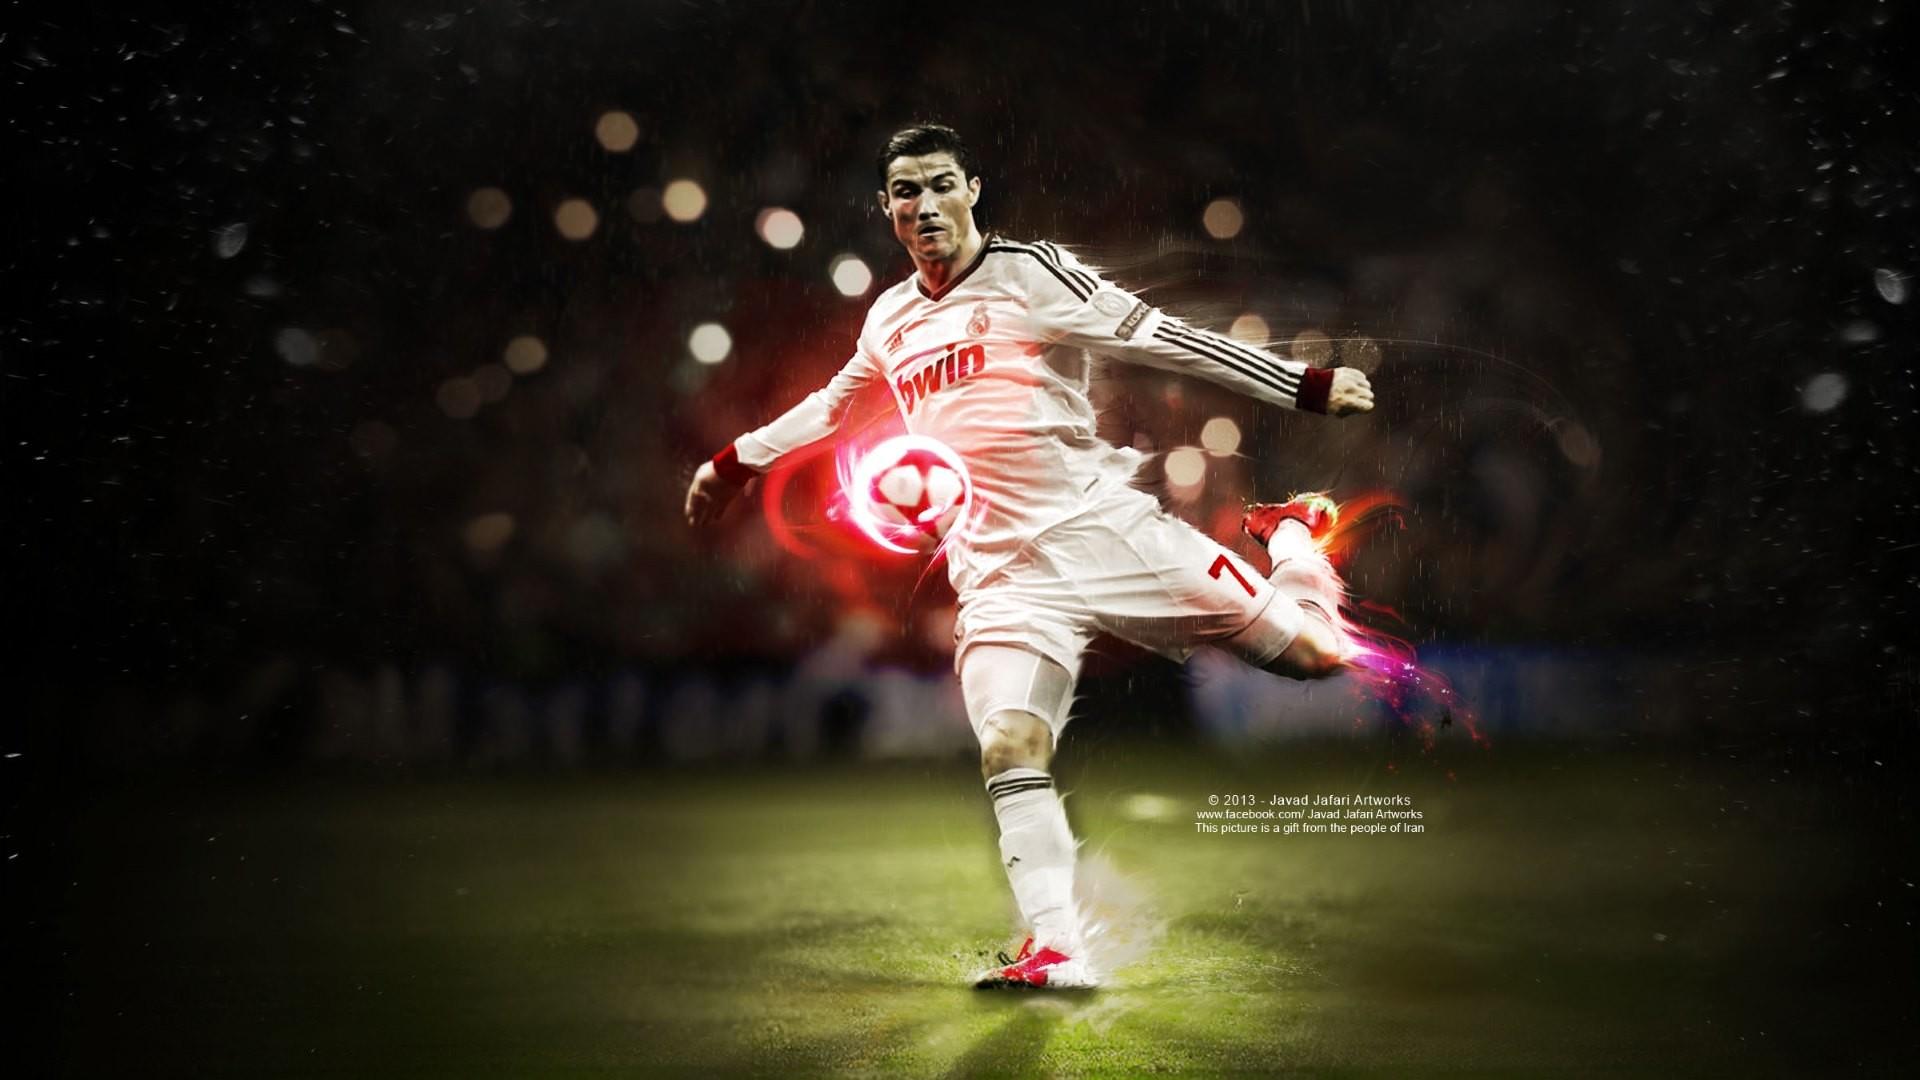 Cristiano Ronaldo Wallpaper 2018 72 Images